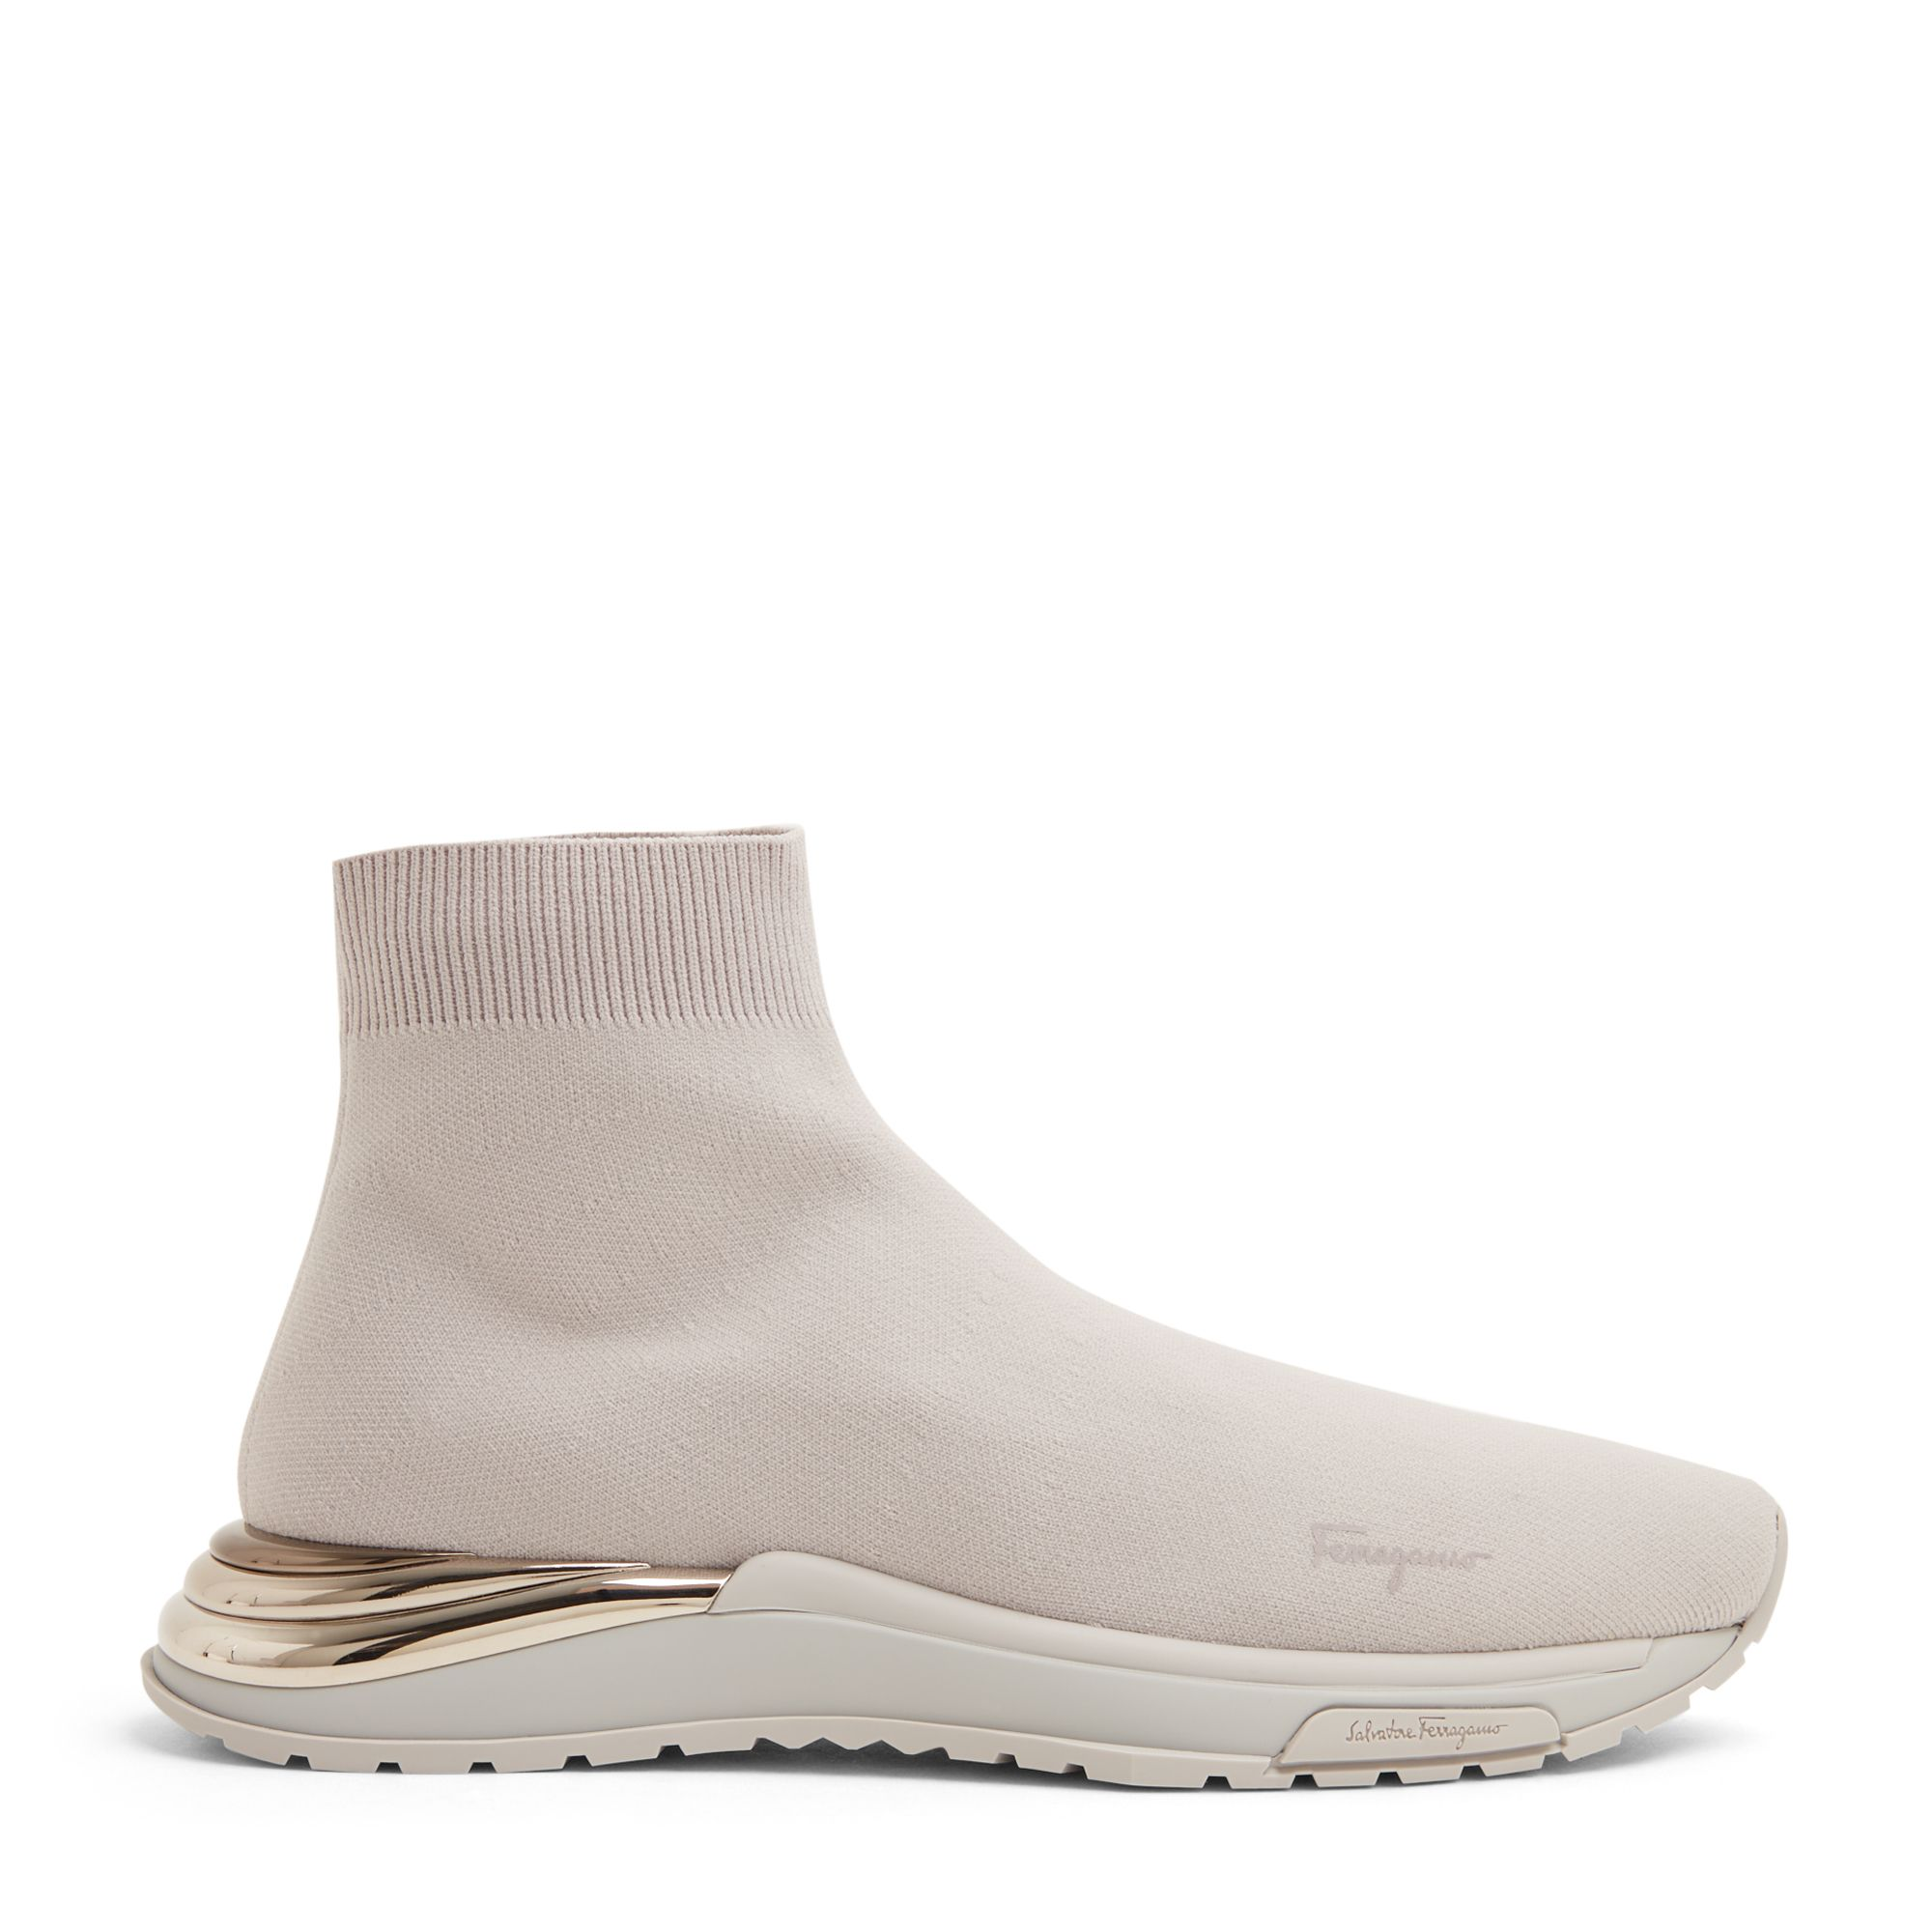 Ninette sock sneakers